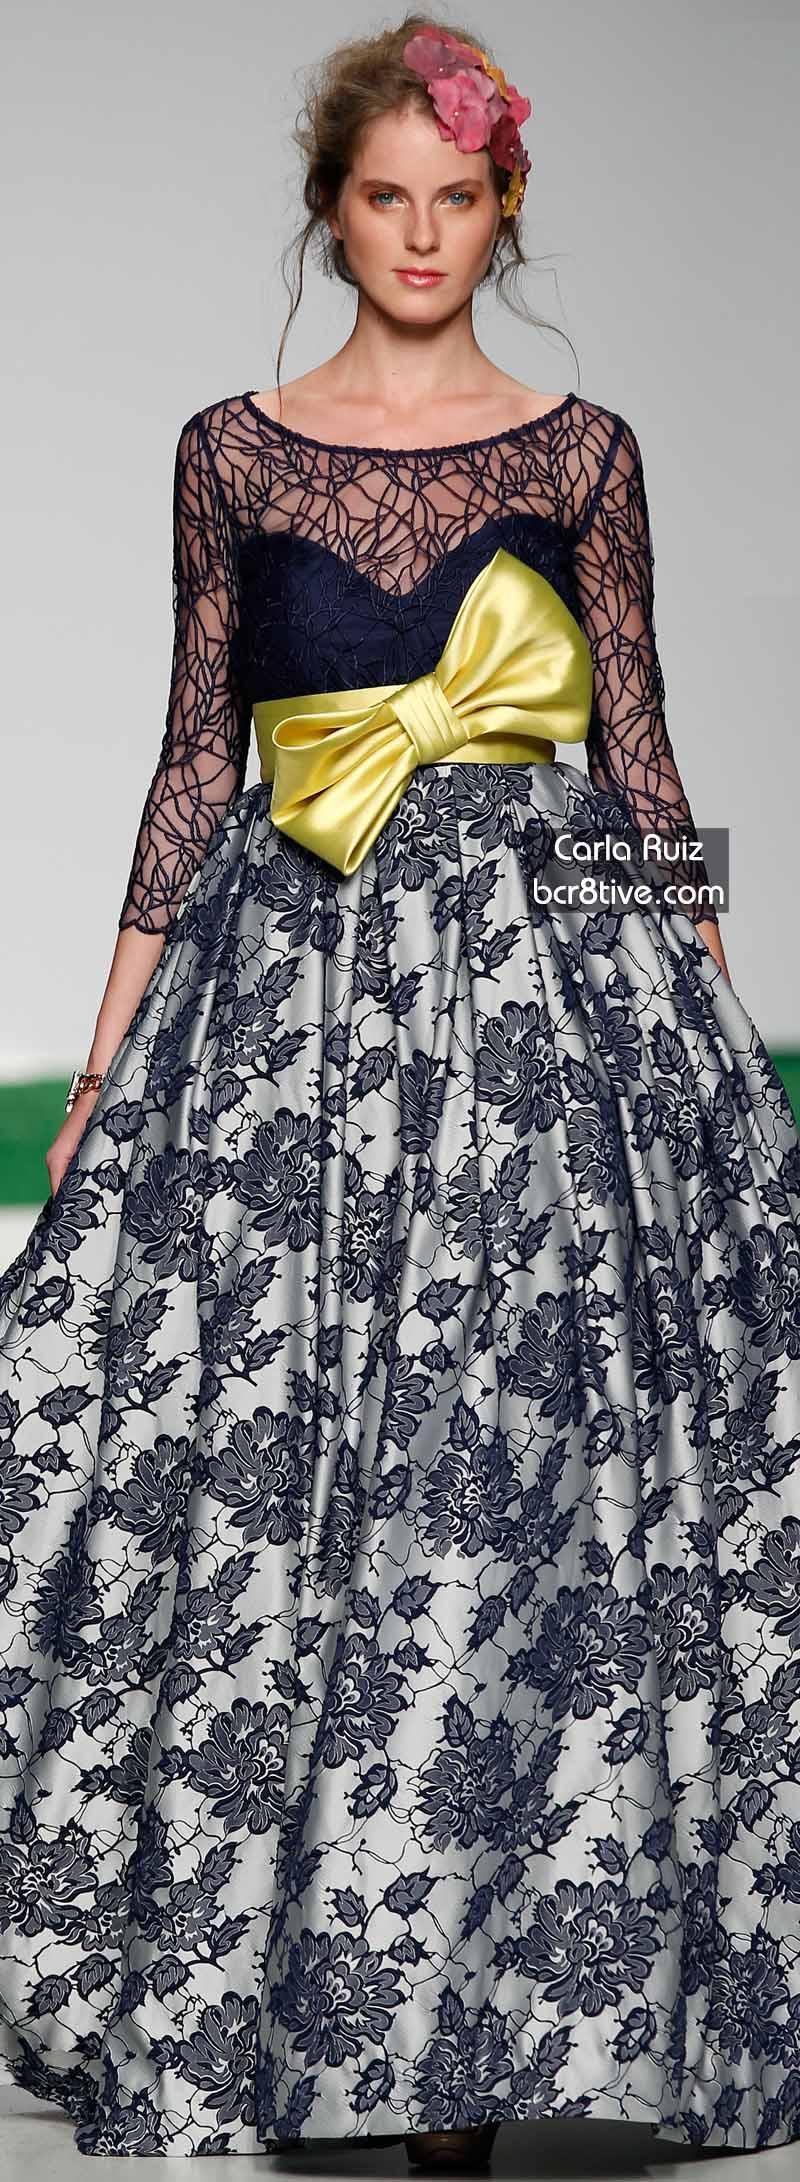 Carla Ruiz Spring 2014